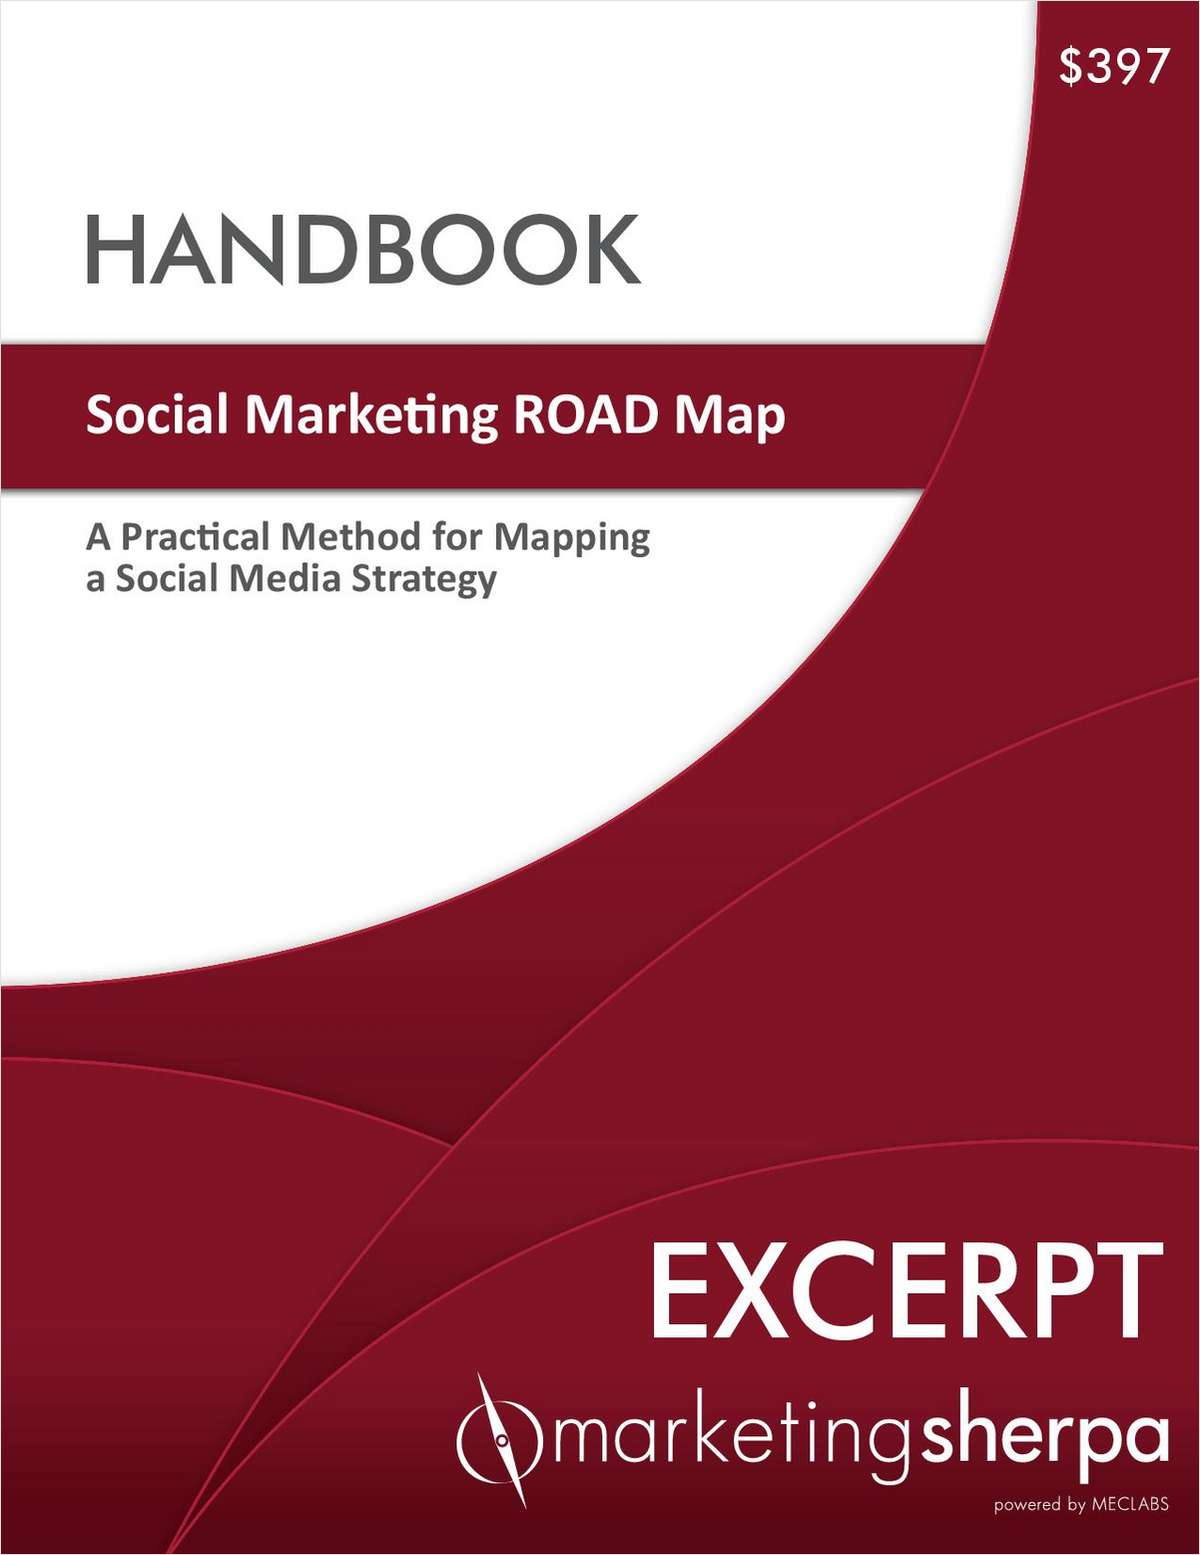 Social Marketing ROAD Map Handbook -- Free Excerpt